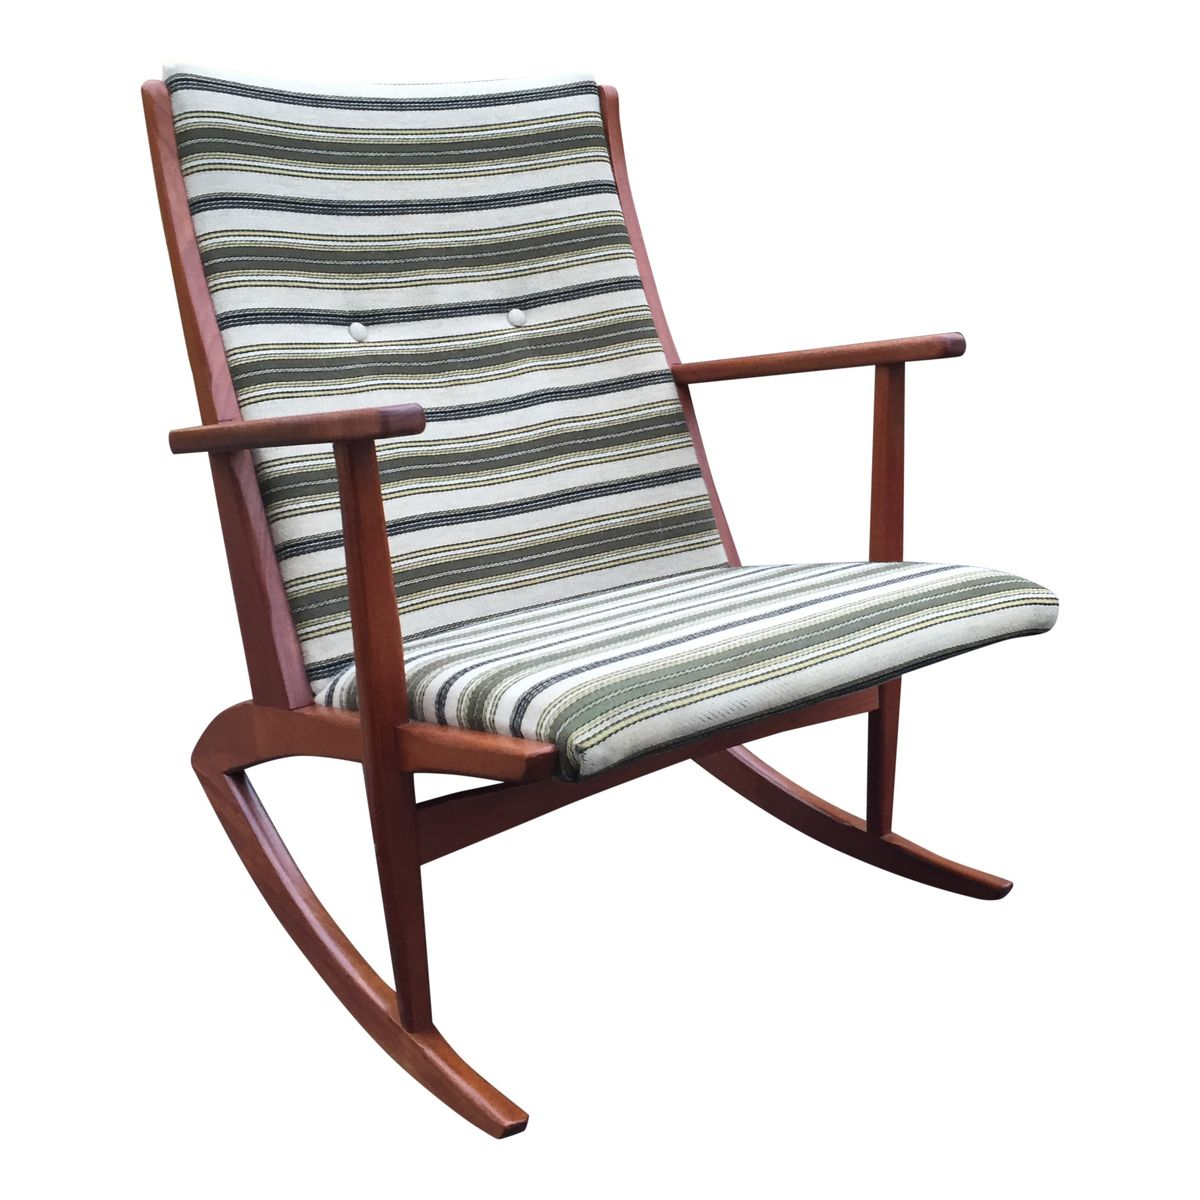 Teak Rocking Chair By Georg Jensen For Tønder Møbelværk For Sale At . Full resolution  img, nominally Width 1200 Height 1200 pixels, img with #683930.